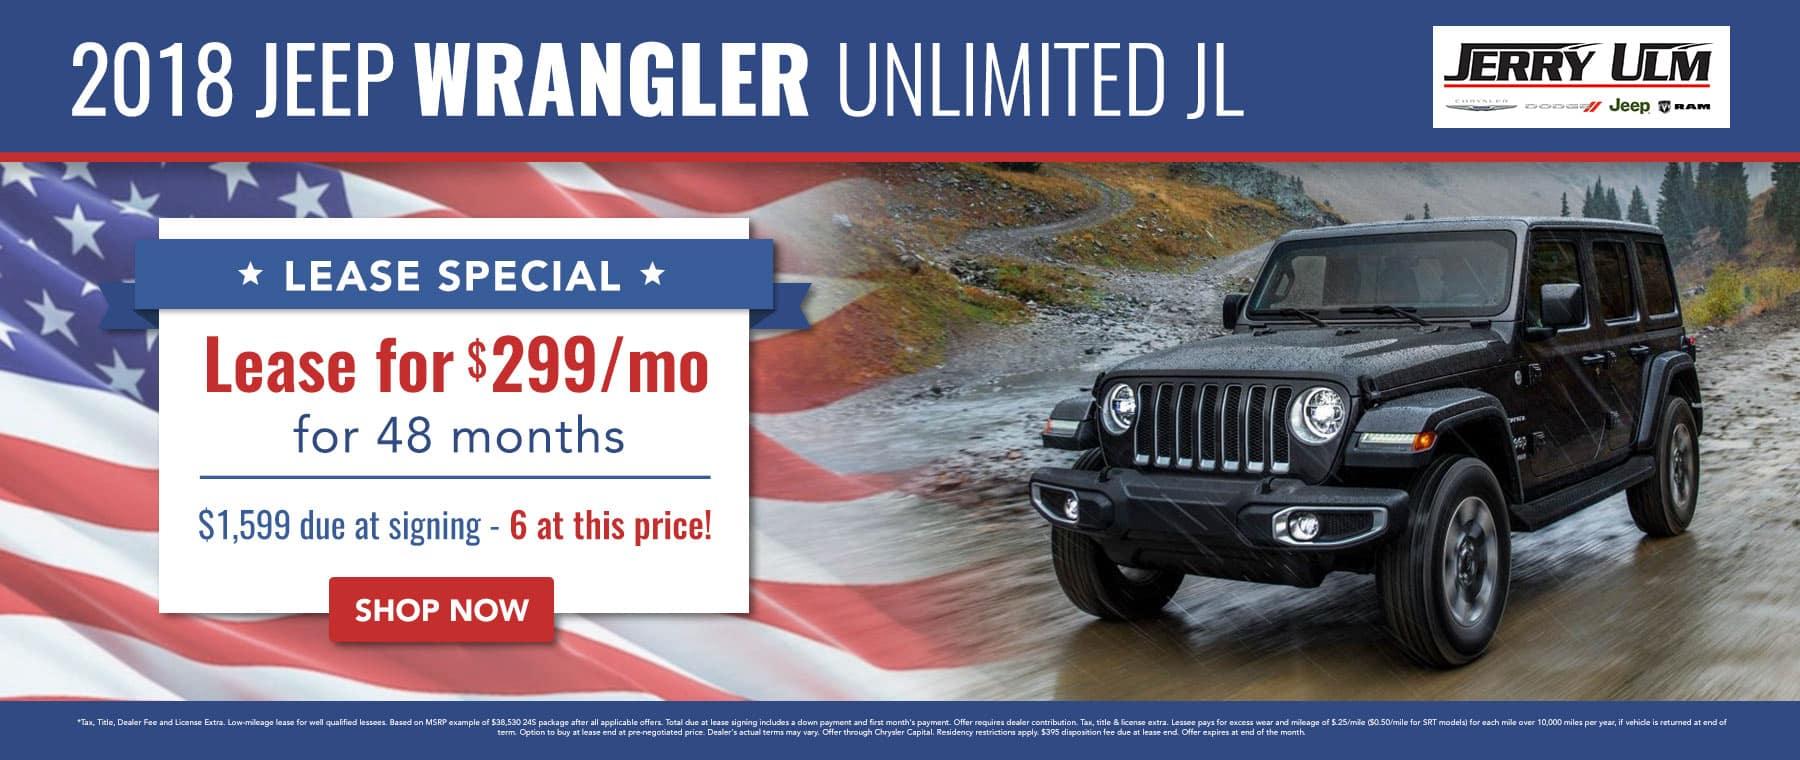 2018 Jeep Wrangler special